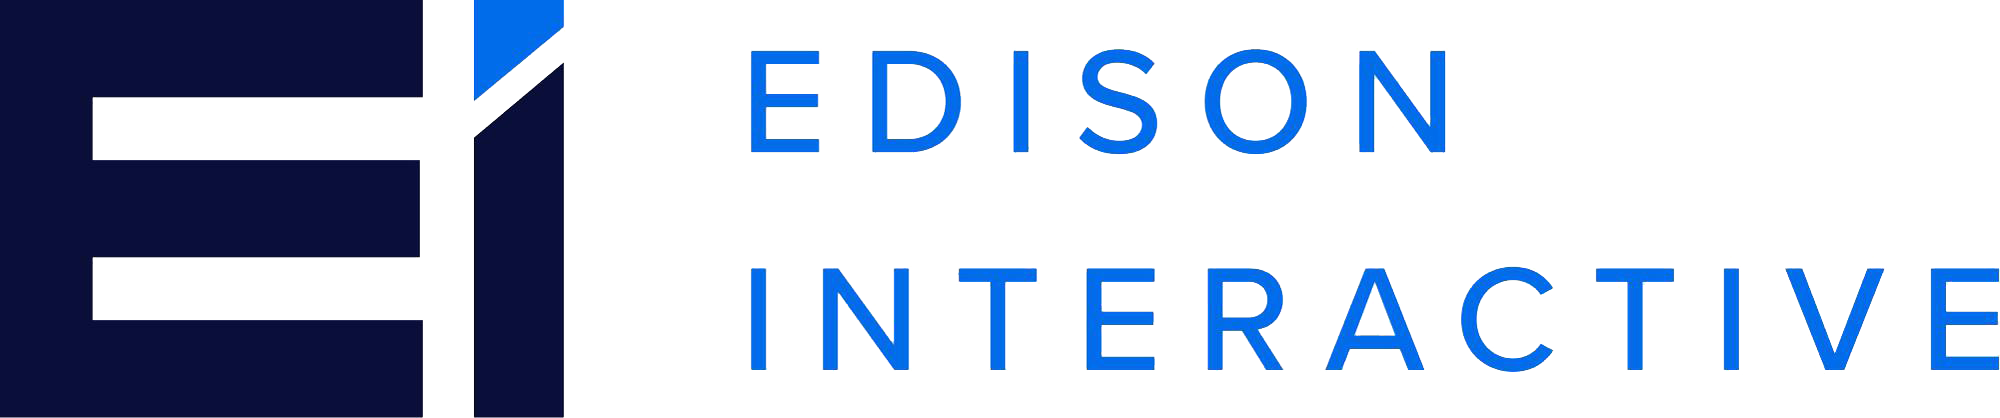 Edison Interactive